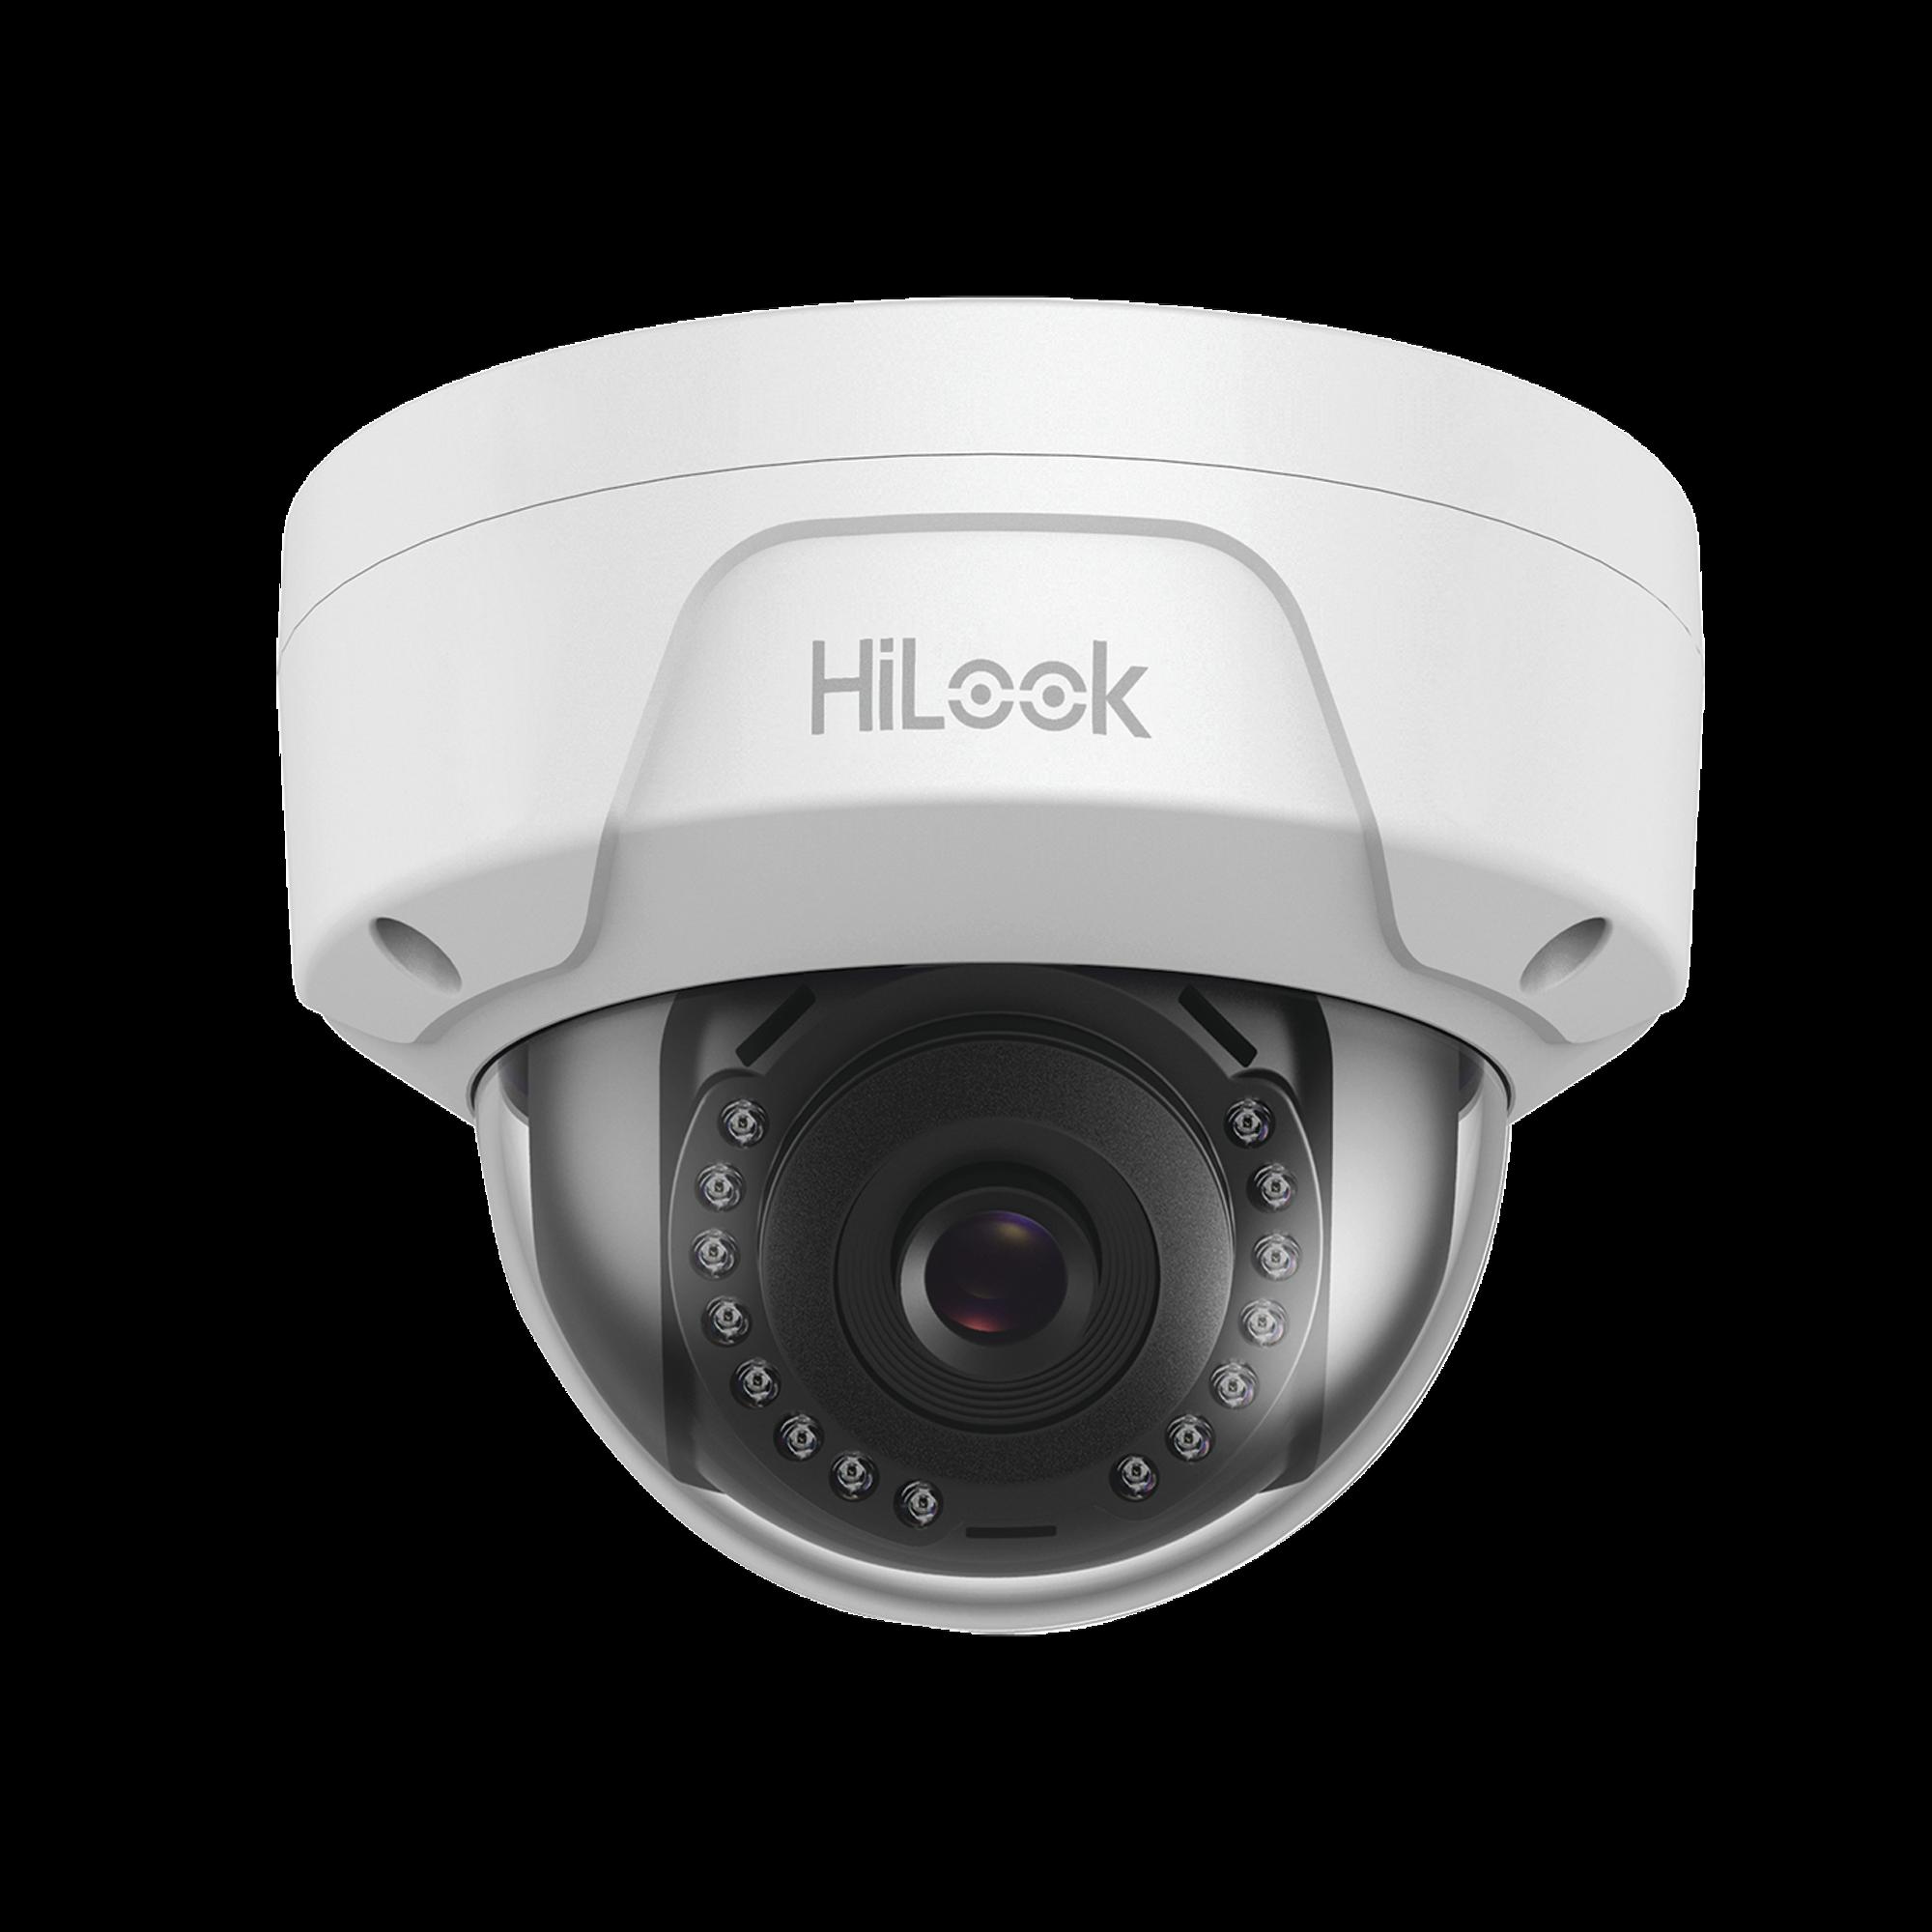 HiLook Series / Domo IP 2 Megapixel / 30 mts IR / Exterior IP67 / IK10 / dWDR / PoE / Lente 2.8 mm